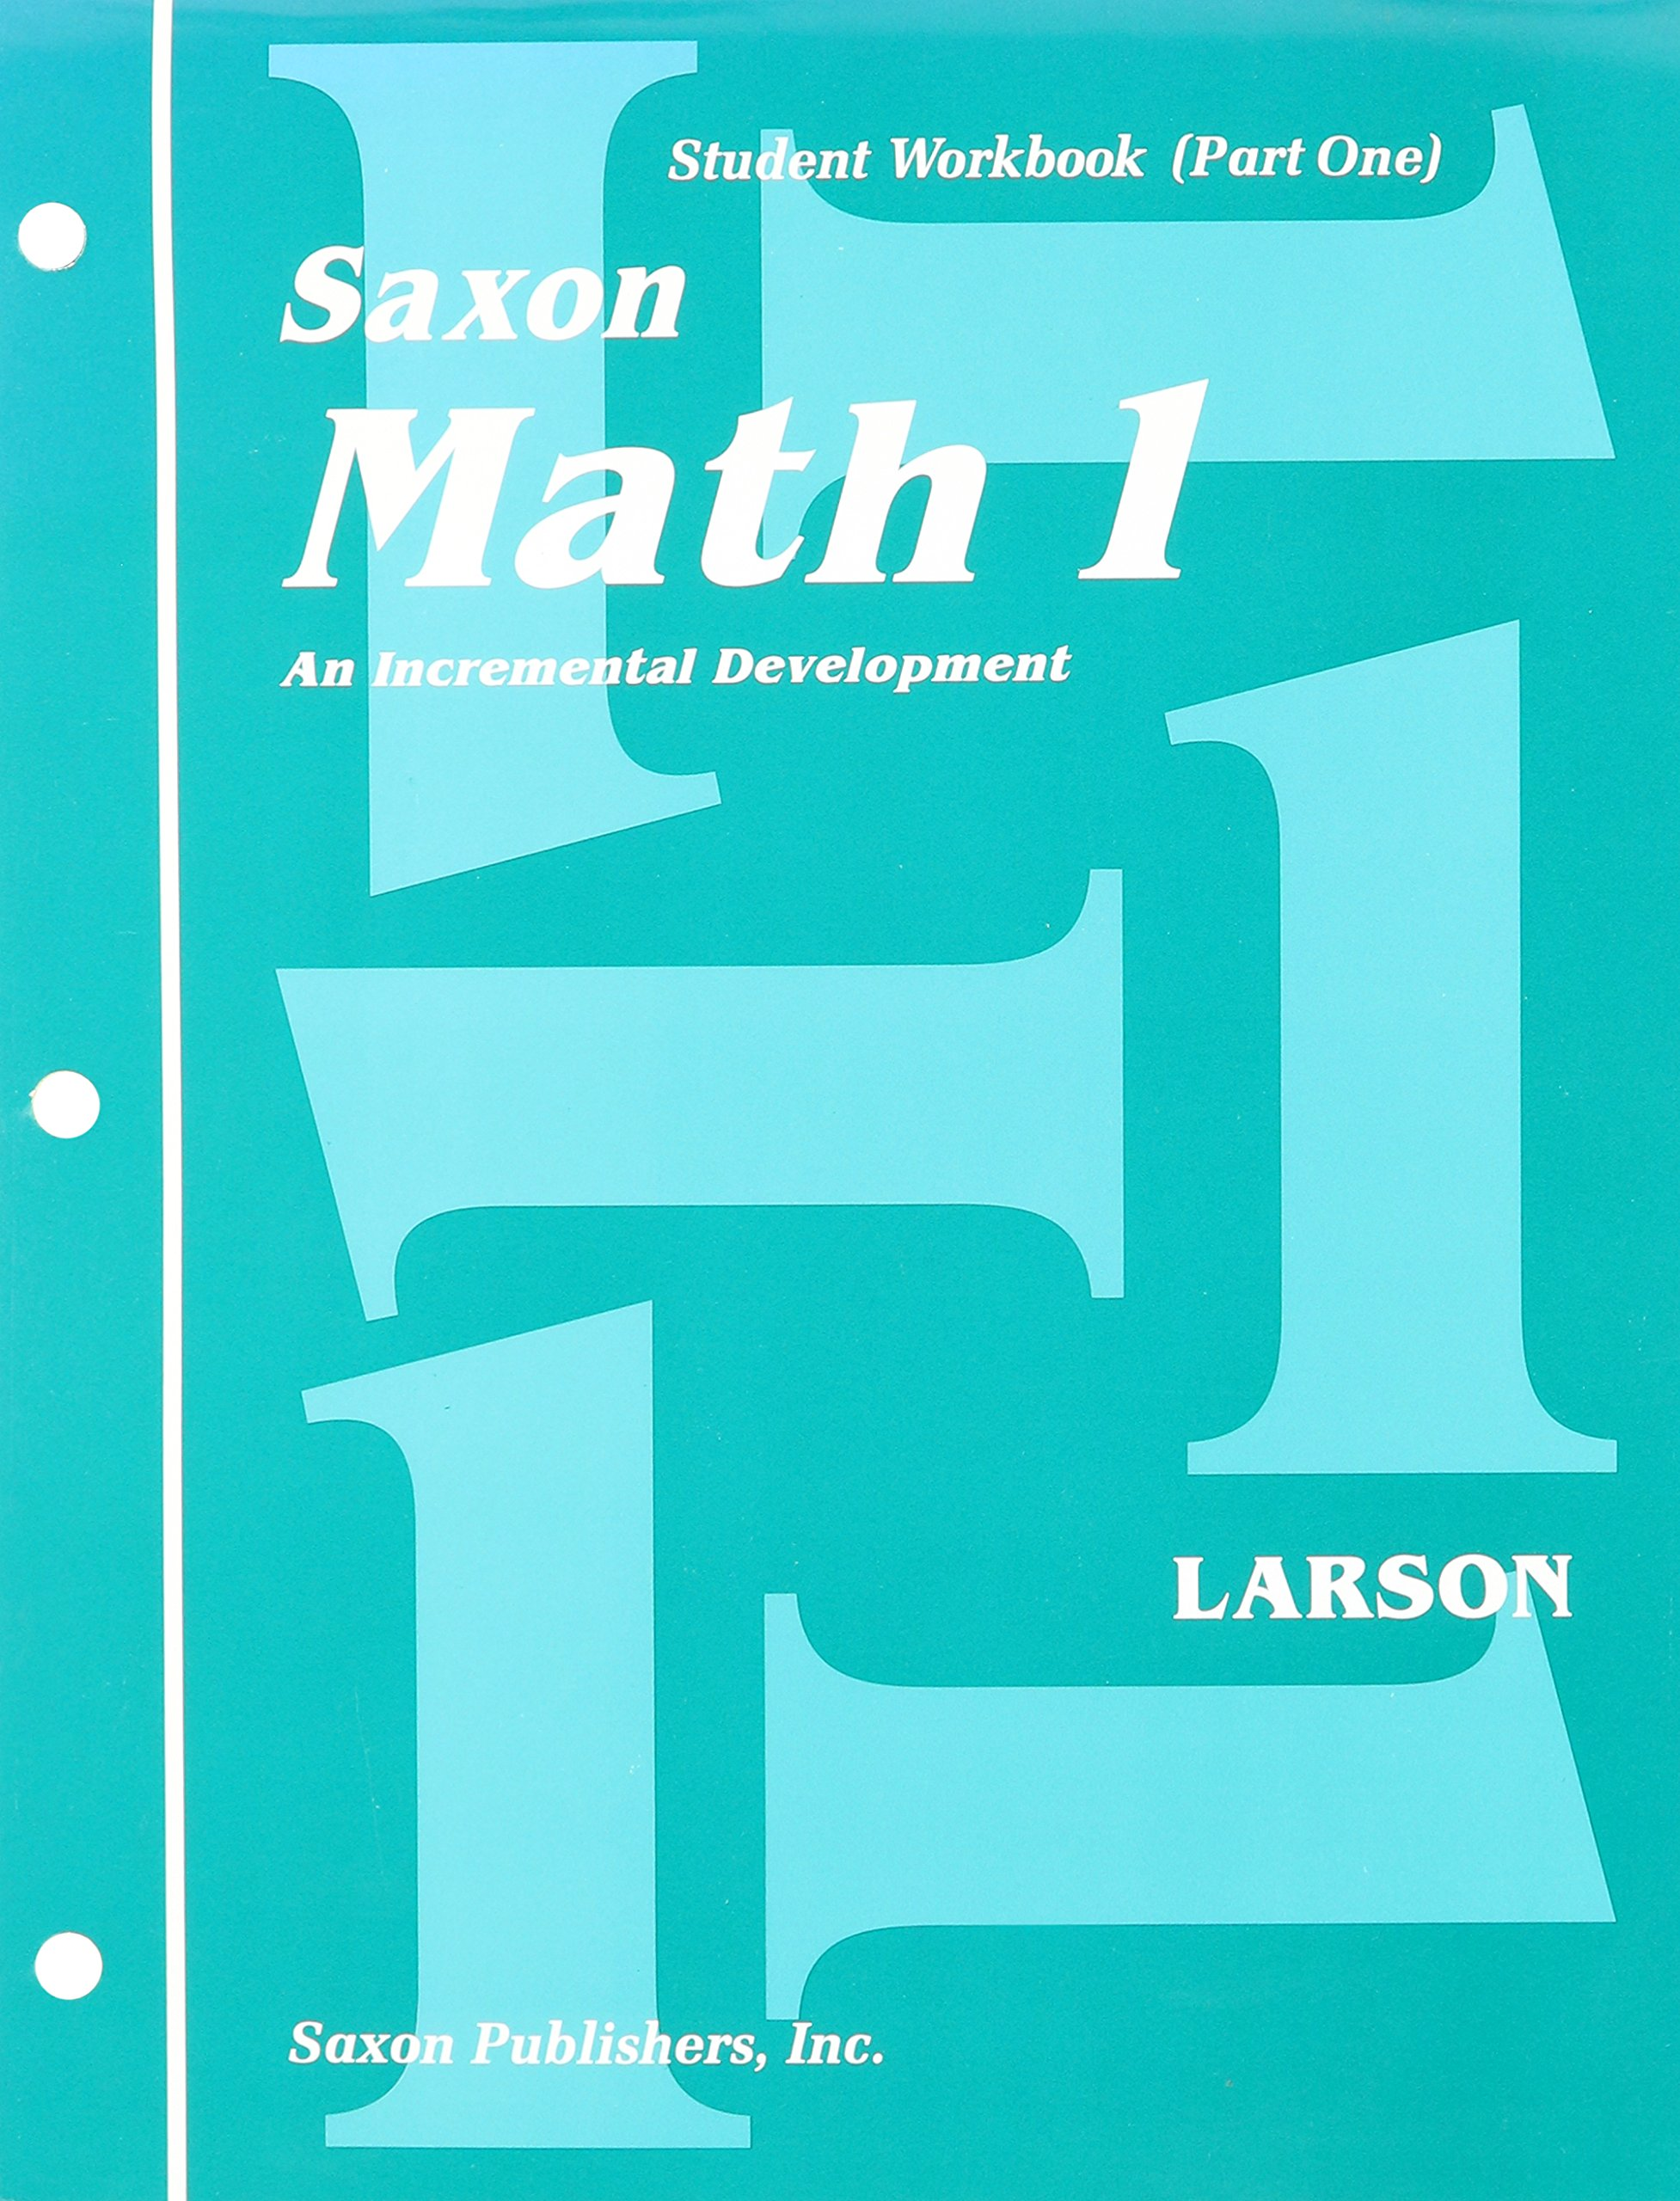 saxon math 1 student workbook part 1 nancy larson linda larson